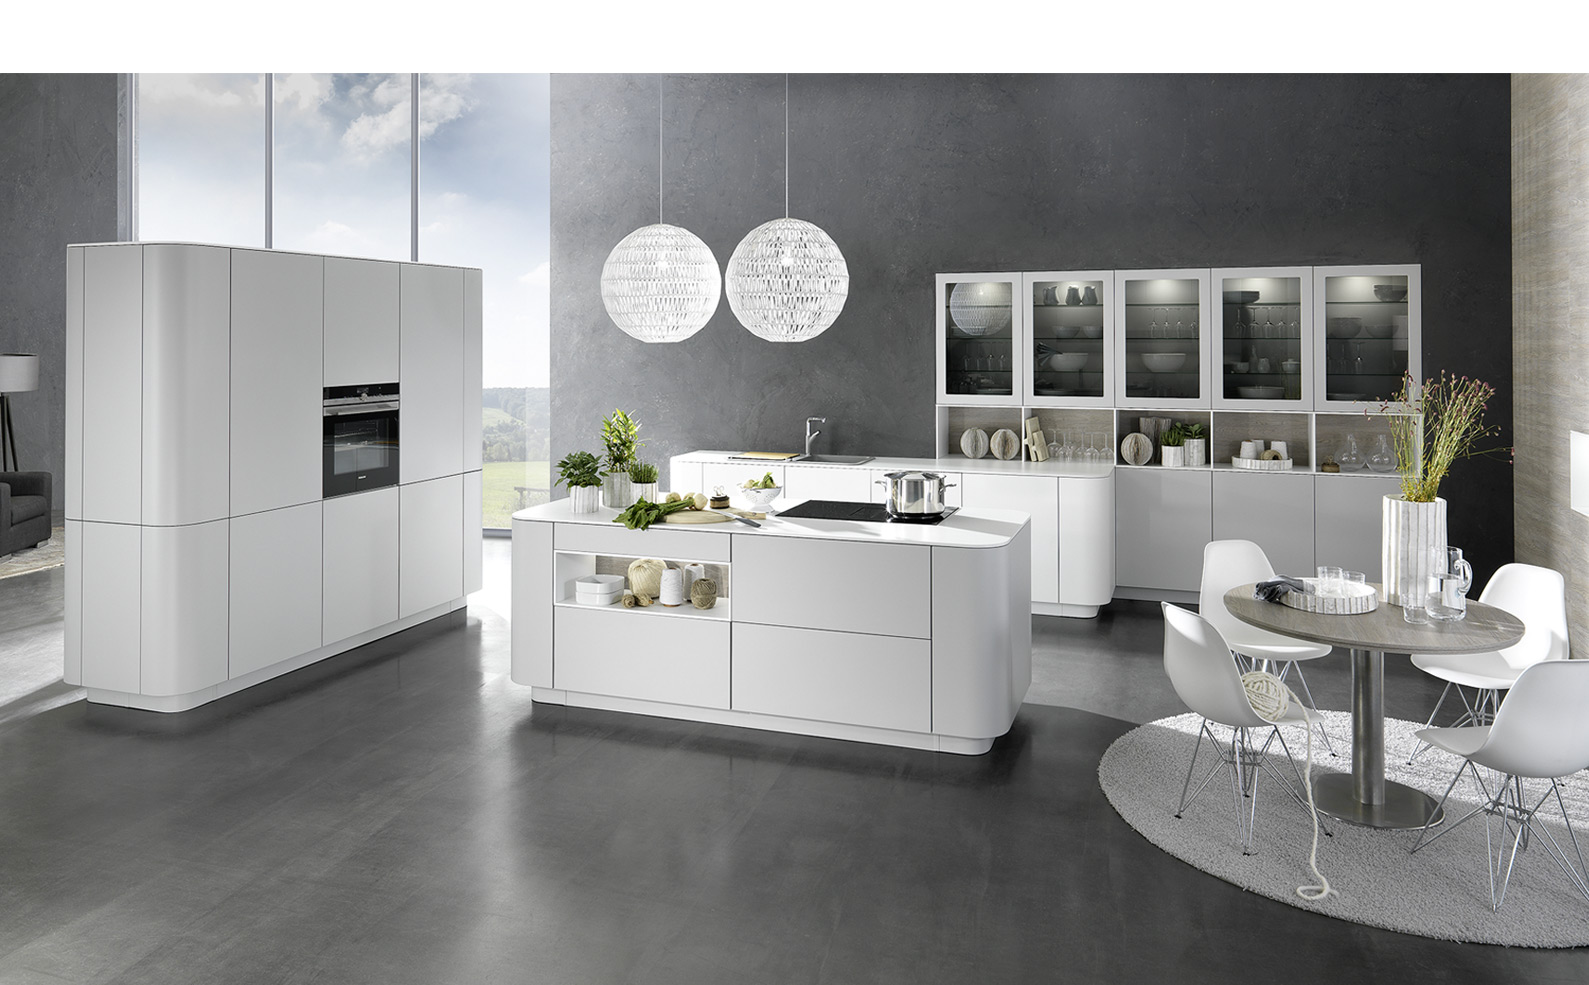 Kitchen Direct Australia - Kitchen Renovations Sydney Slide 3 ...